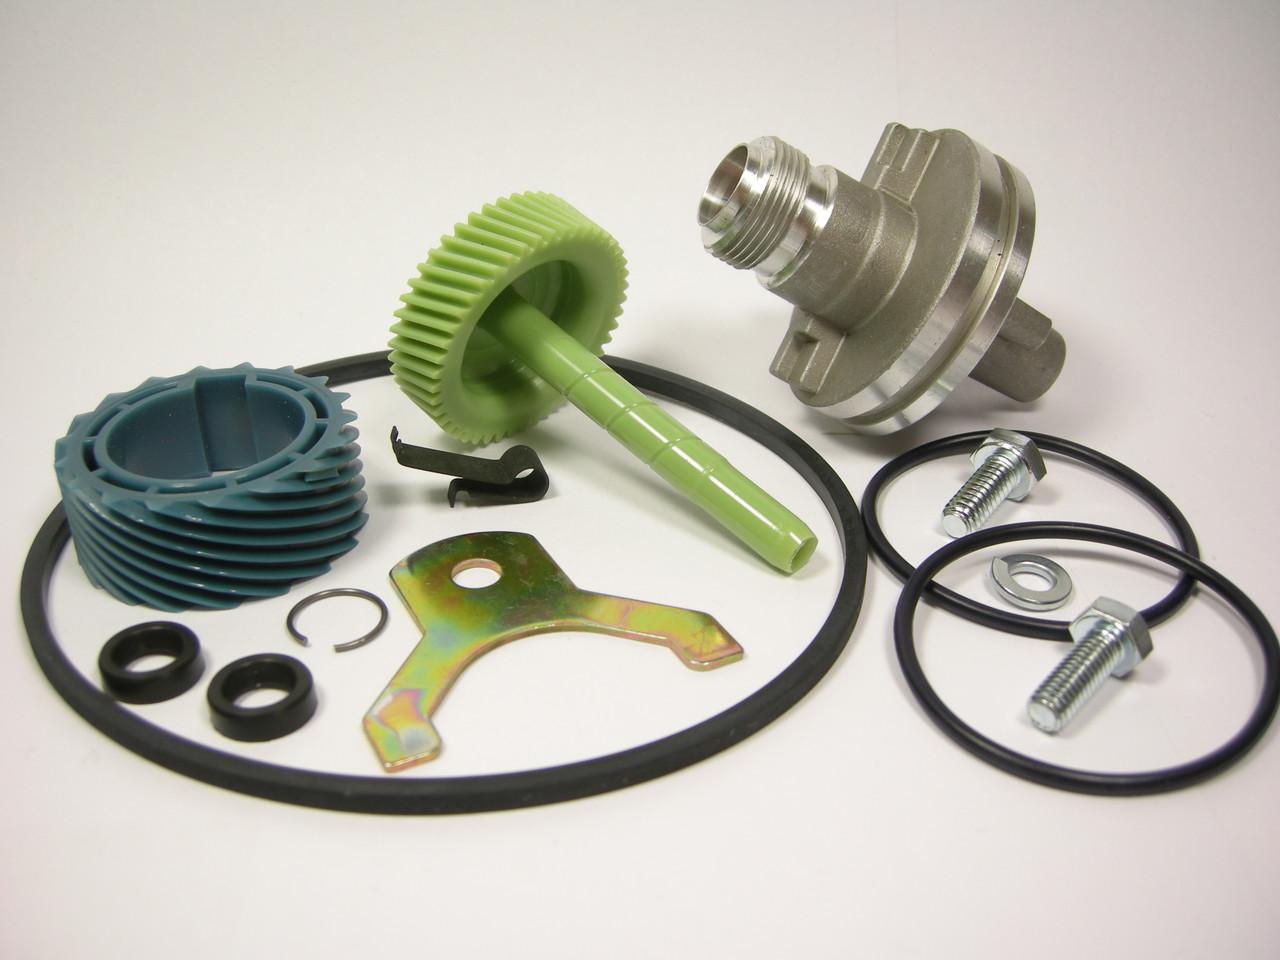 700R4 TH350 18 & 45 Tooth Speedo Kit Gears Housing Speedometer